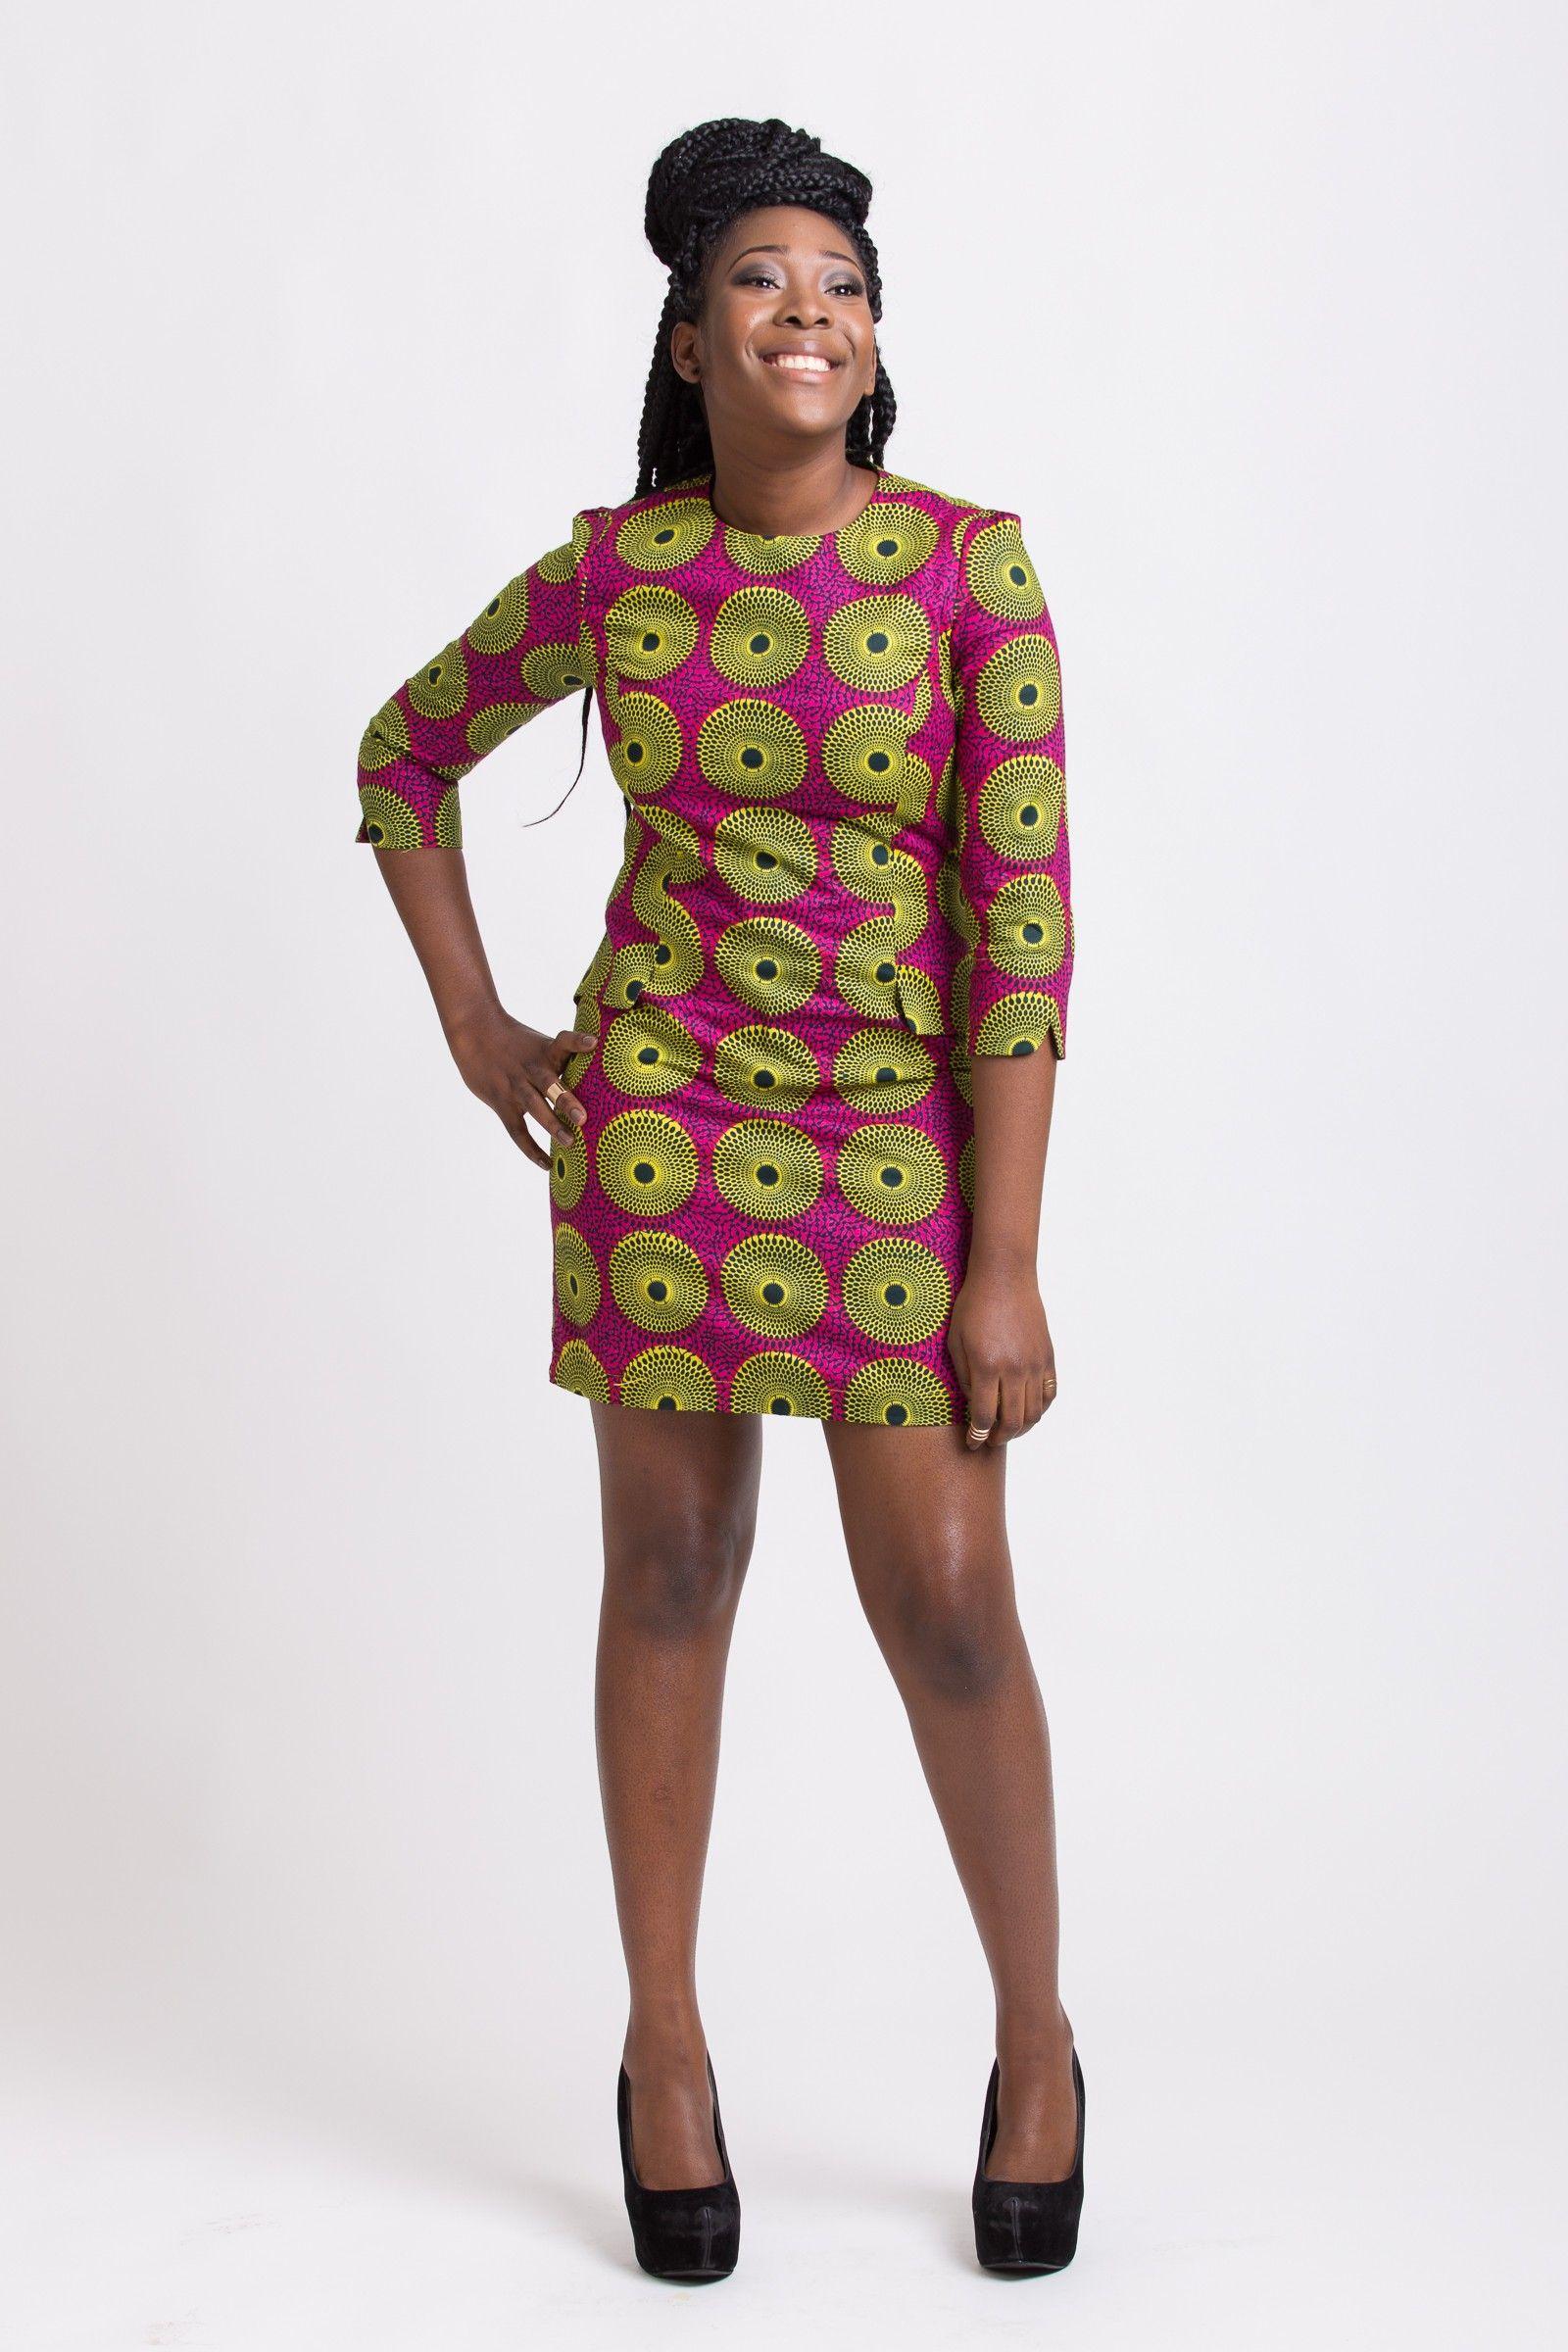 robe en tissu wax model pinterest robe droite pagne et combinaison africaine. Black Bedroom Furniture Sets. Home Design Ideas